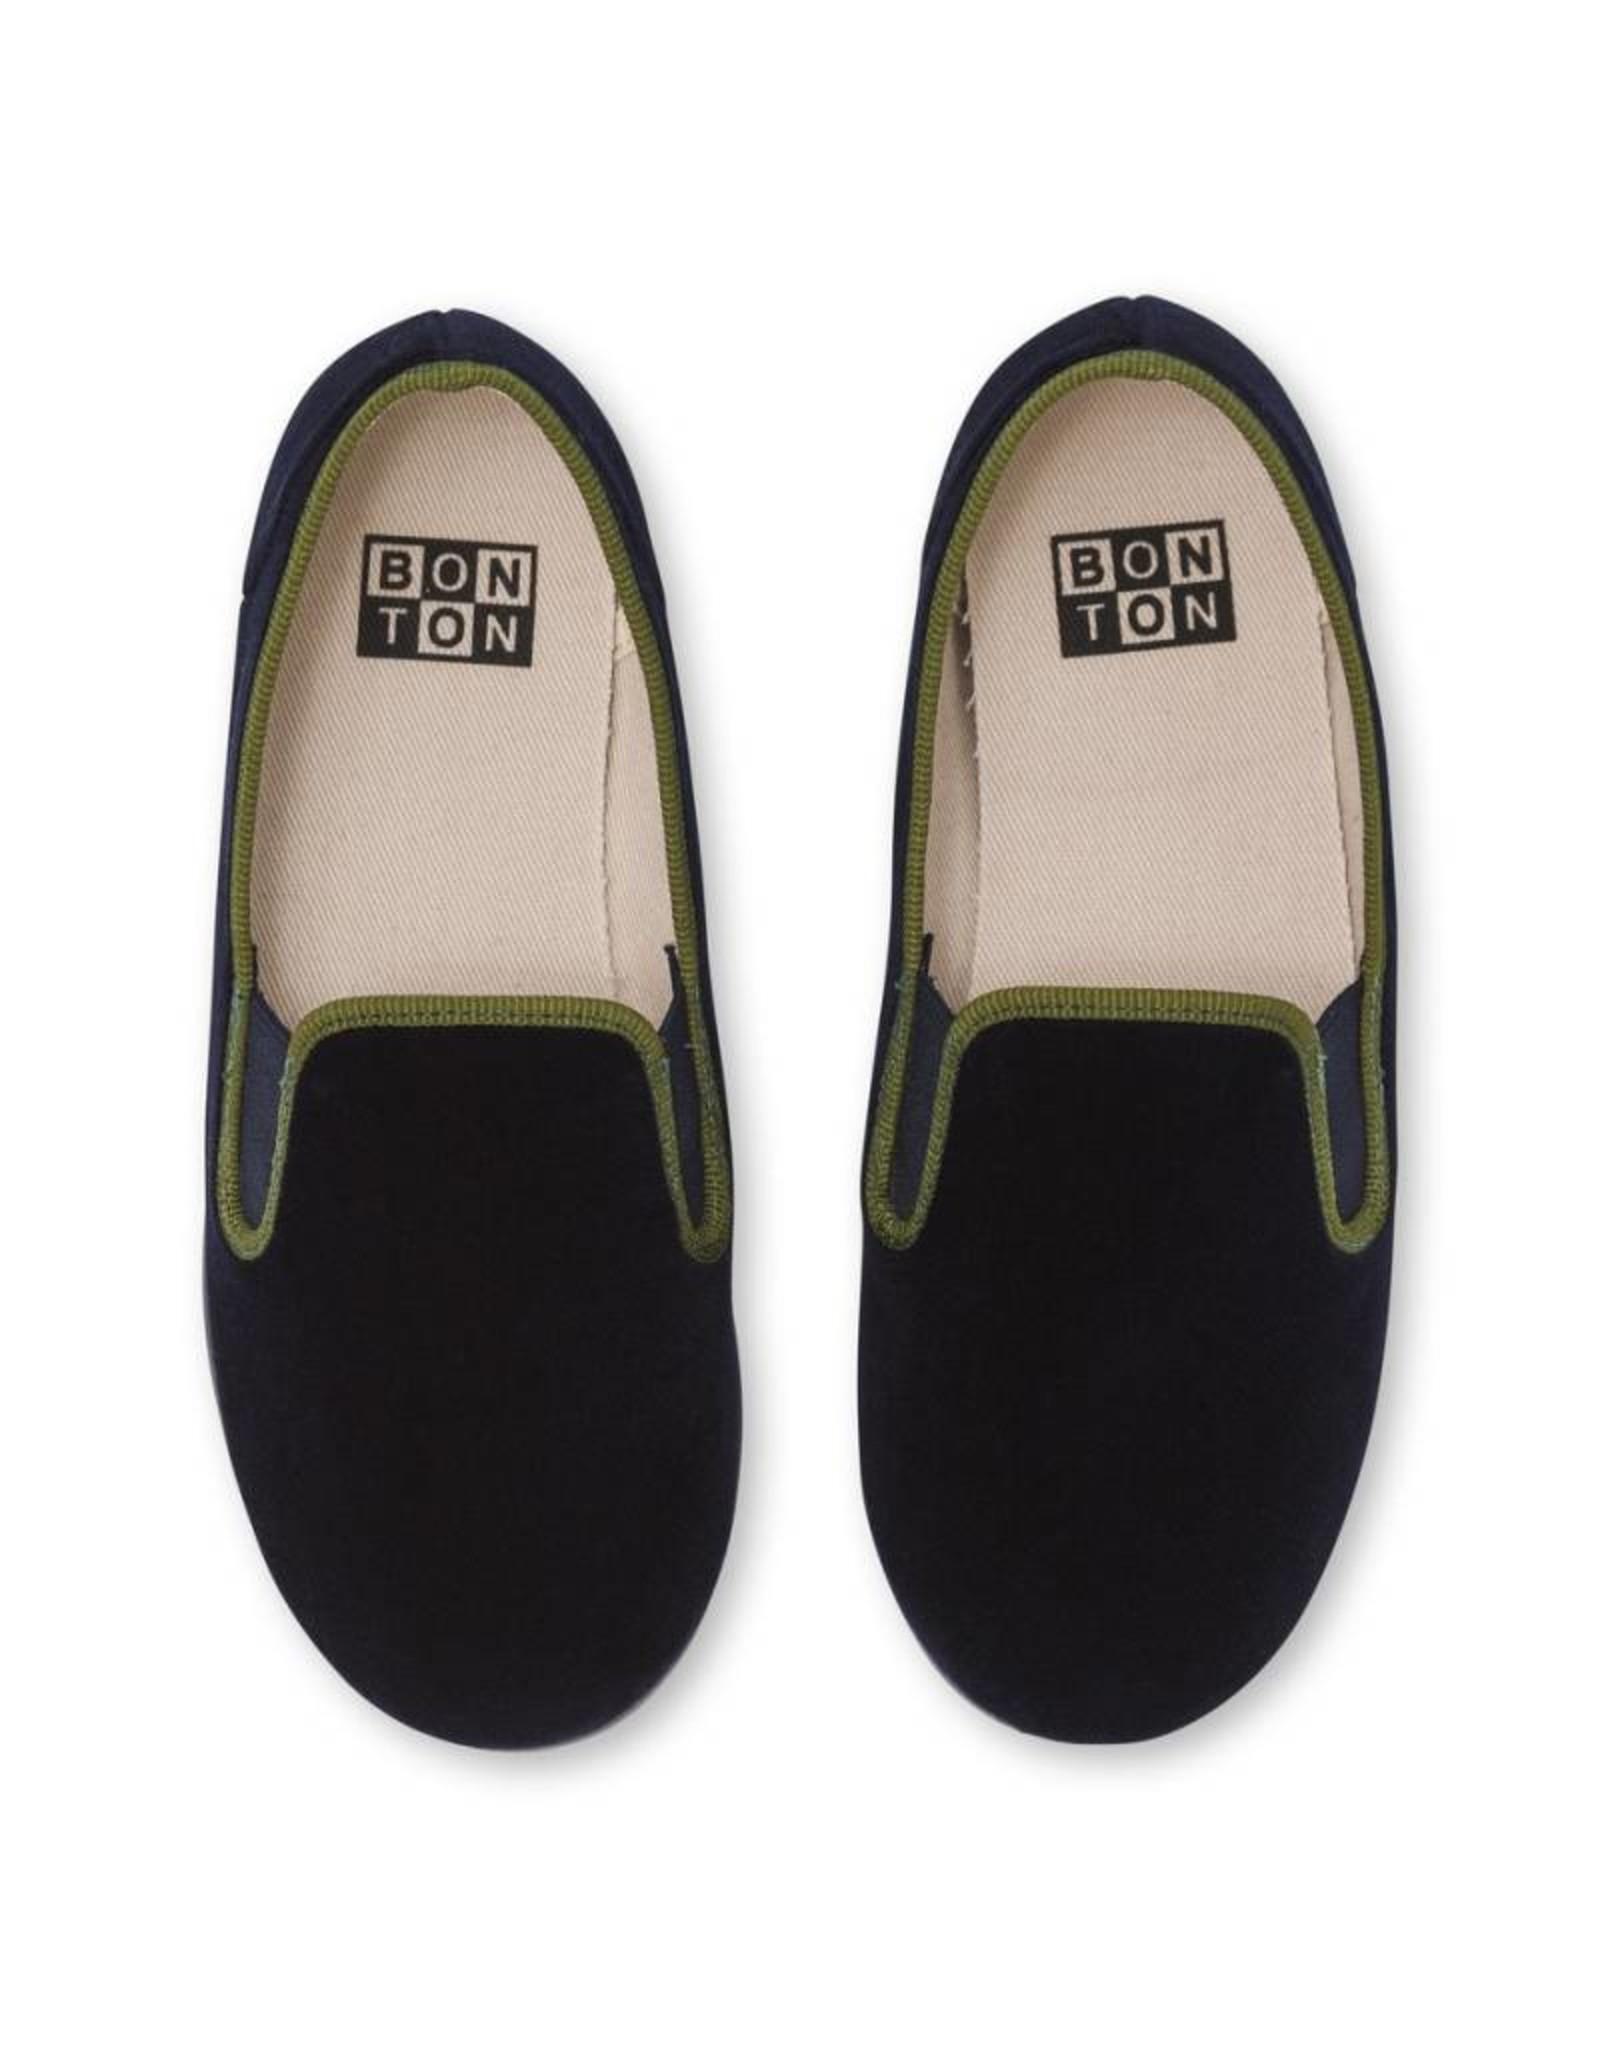 Kid's elastic slippers